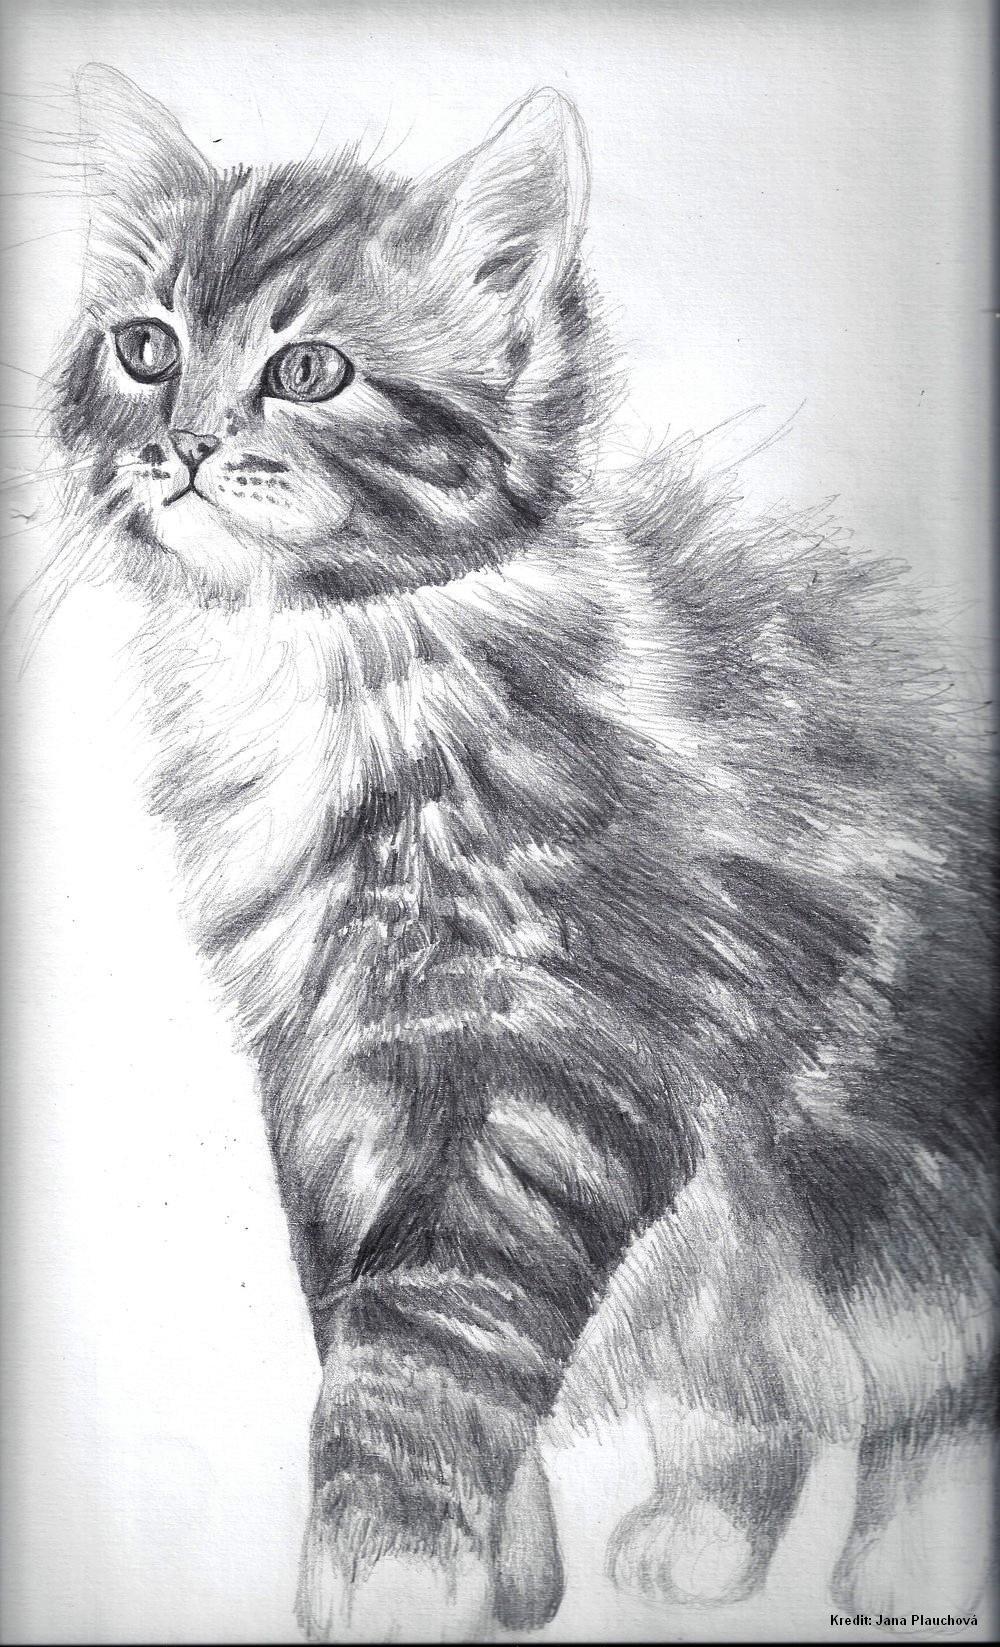 Felis domestica